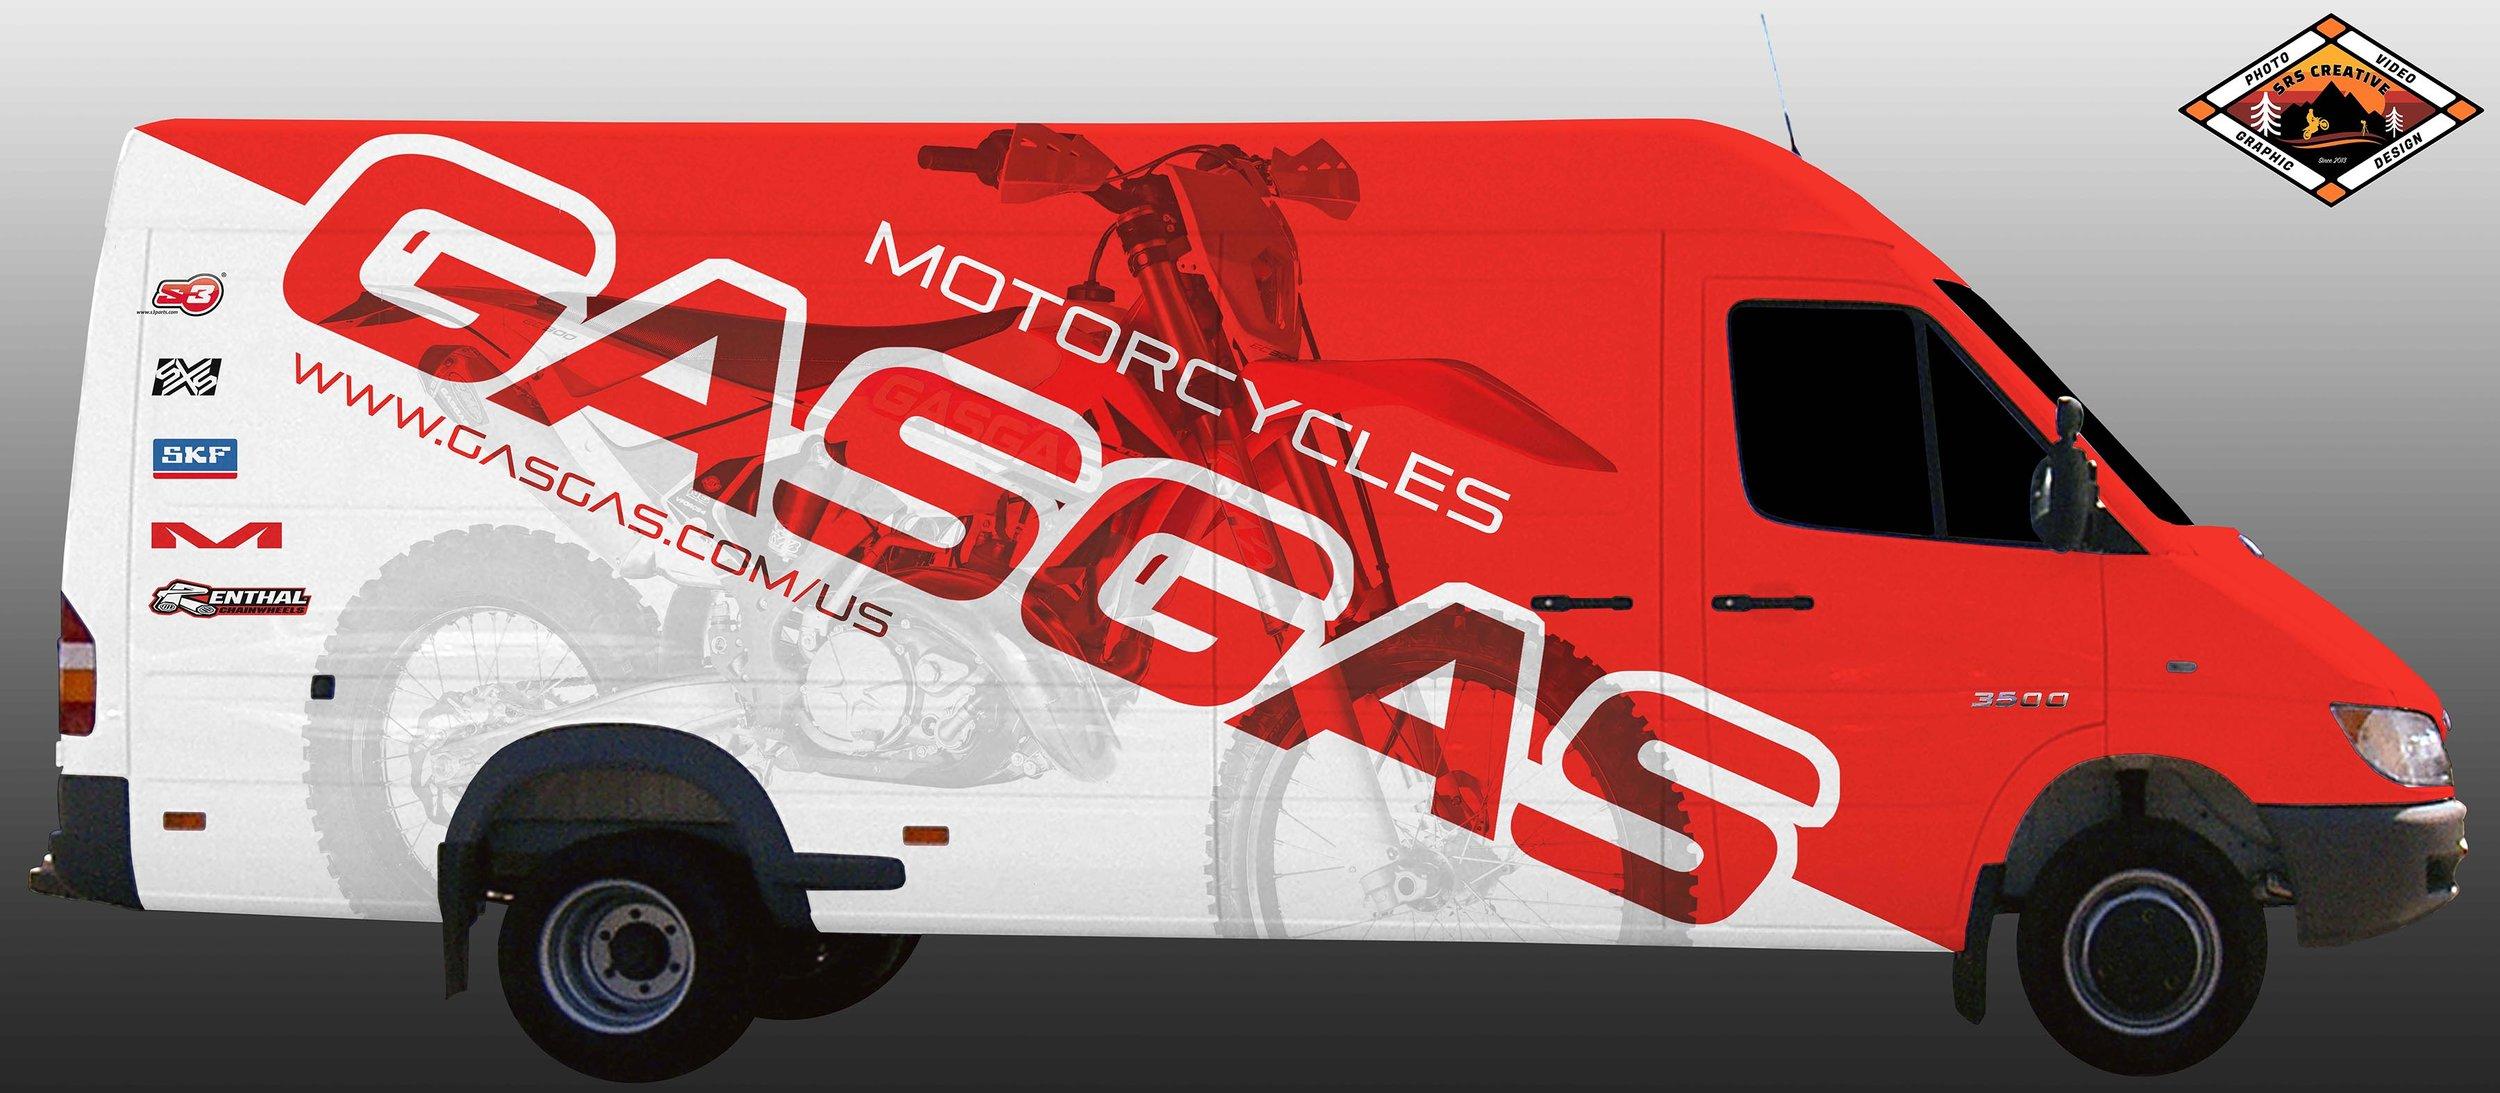 2019 GasGas Van Wrap Concept - Right V1 - LoRes.jpg